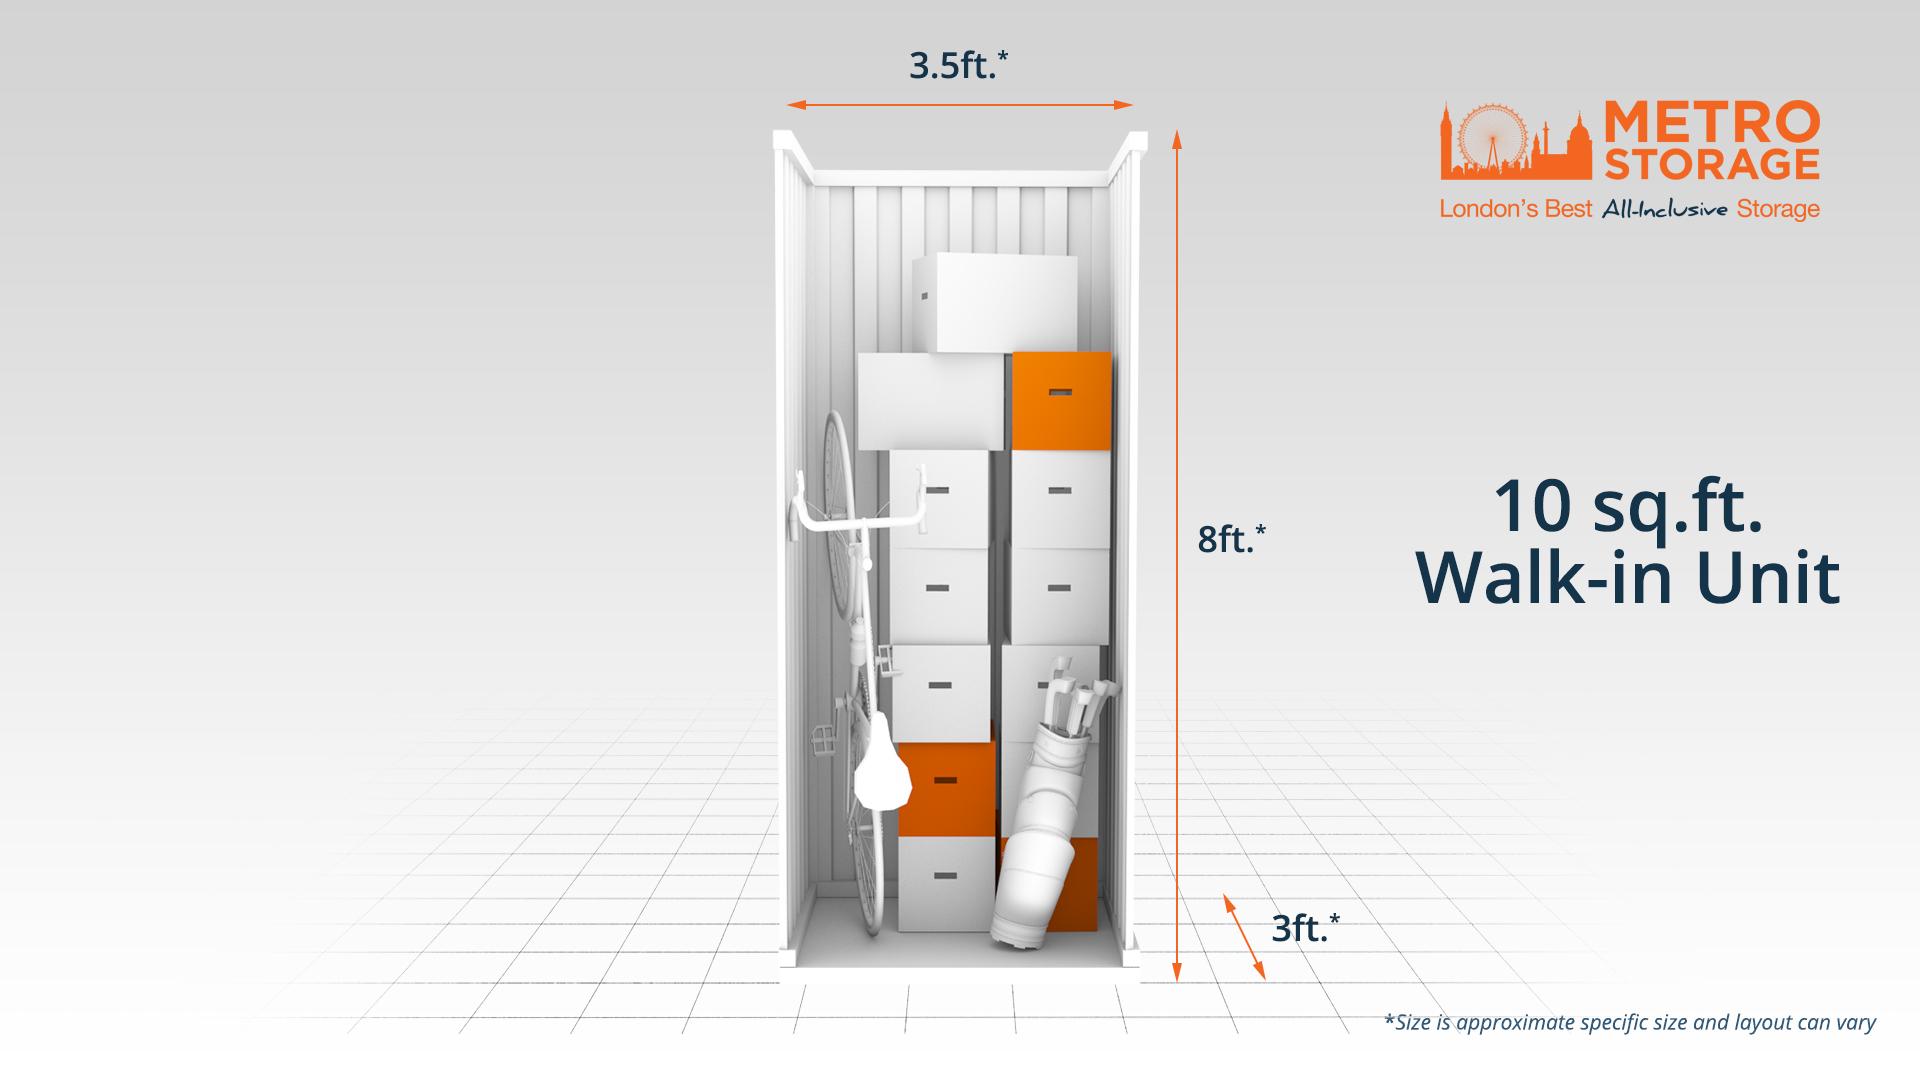 Metro Storage Walkin Unit 10ft sq